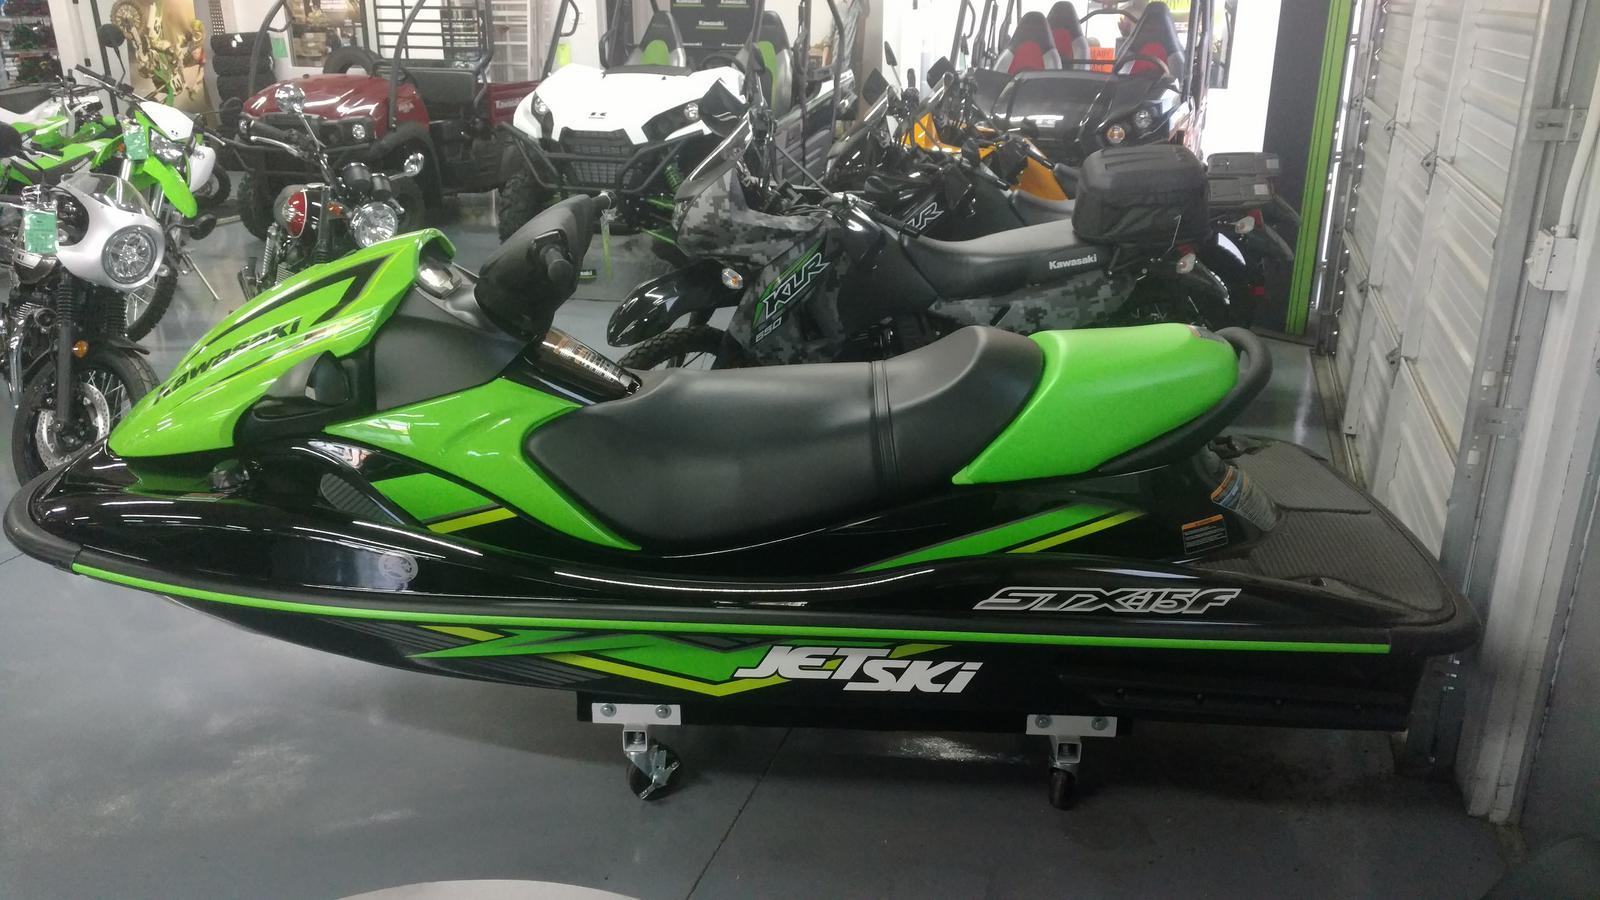 Kawasaki Stx 15F >> 2019 Kawasaki Stx 15f Jet Ski